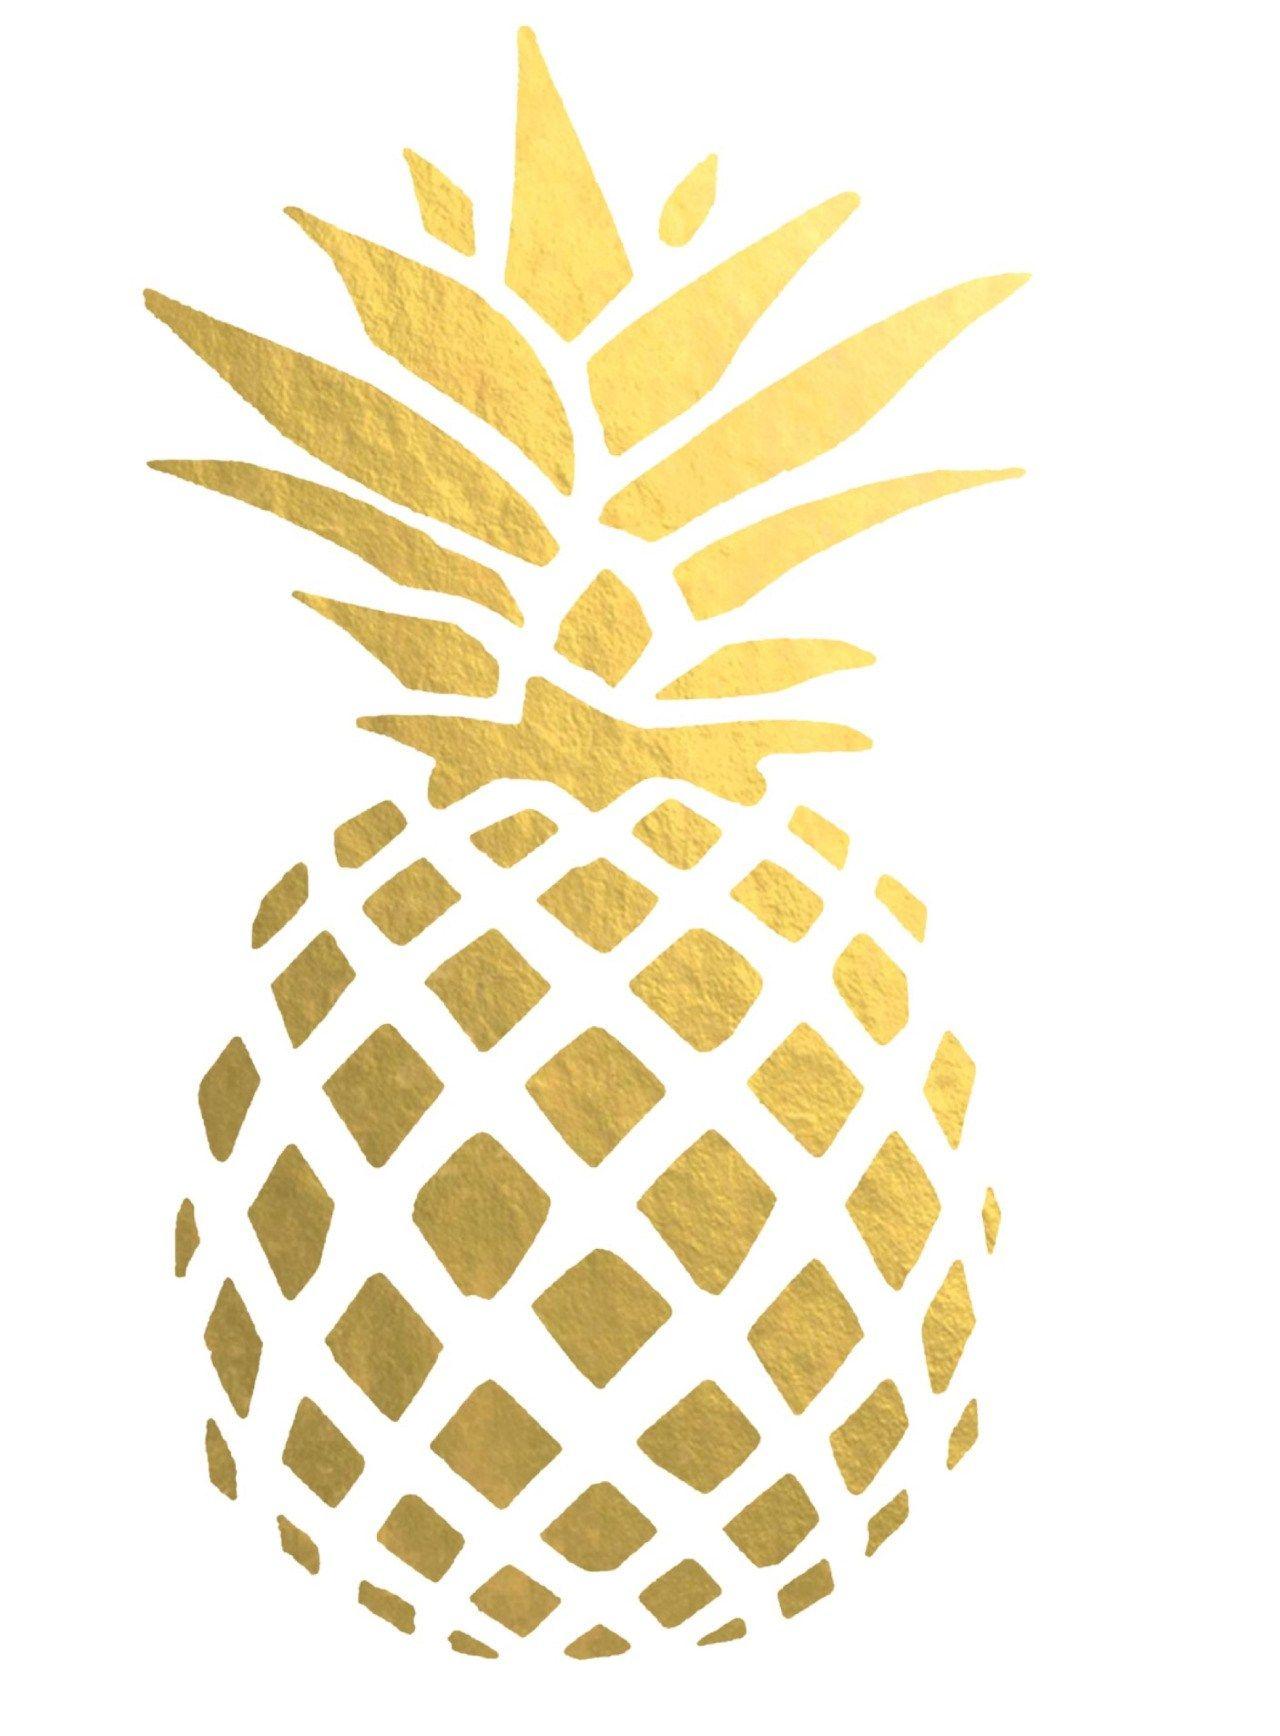 Download The Pretty Pineapple | Pineapple art, Pineapple wallpaper ...